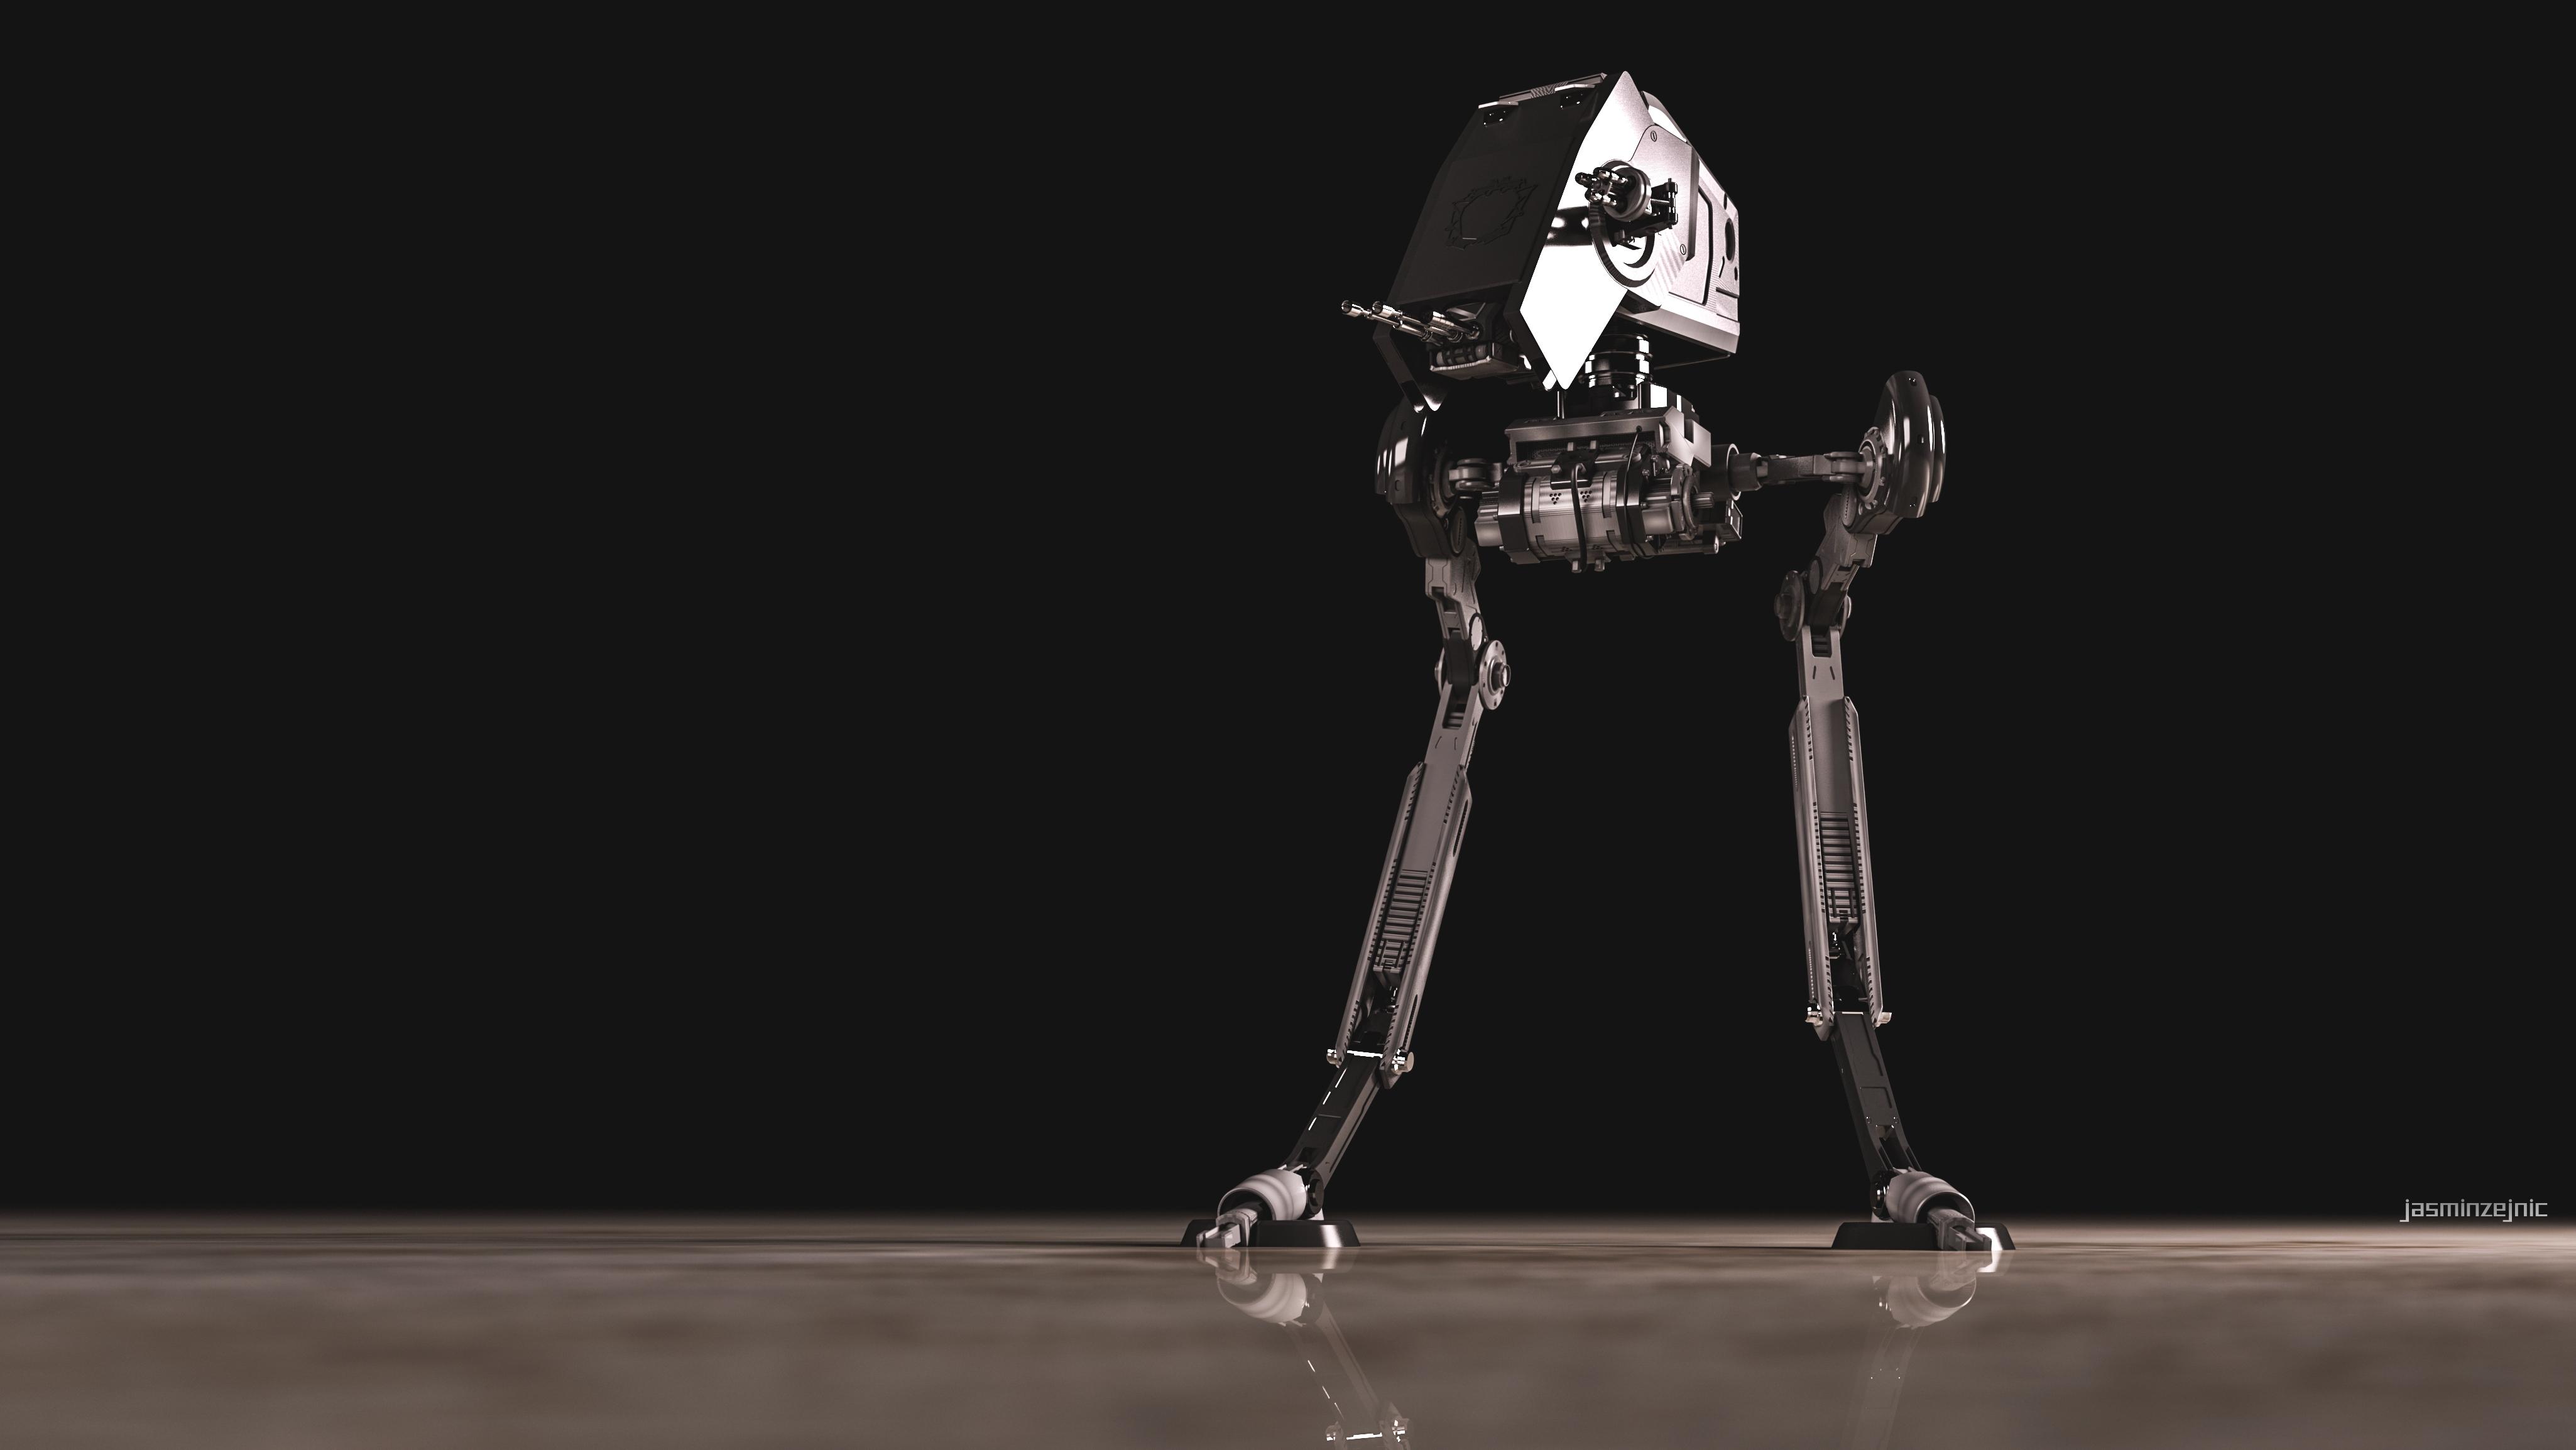 Wallpaper Star Wars Digital Art Robot 3d Render – Fondos de Pantalla